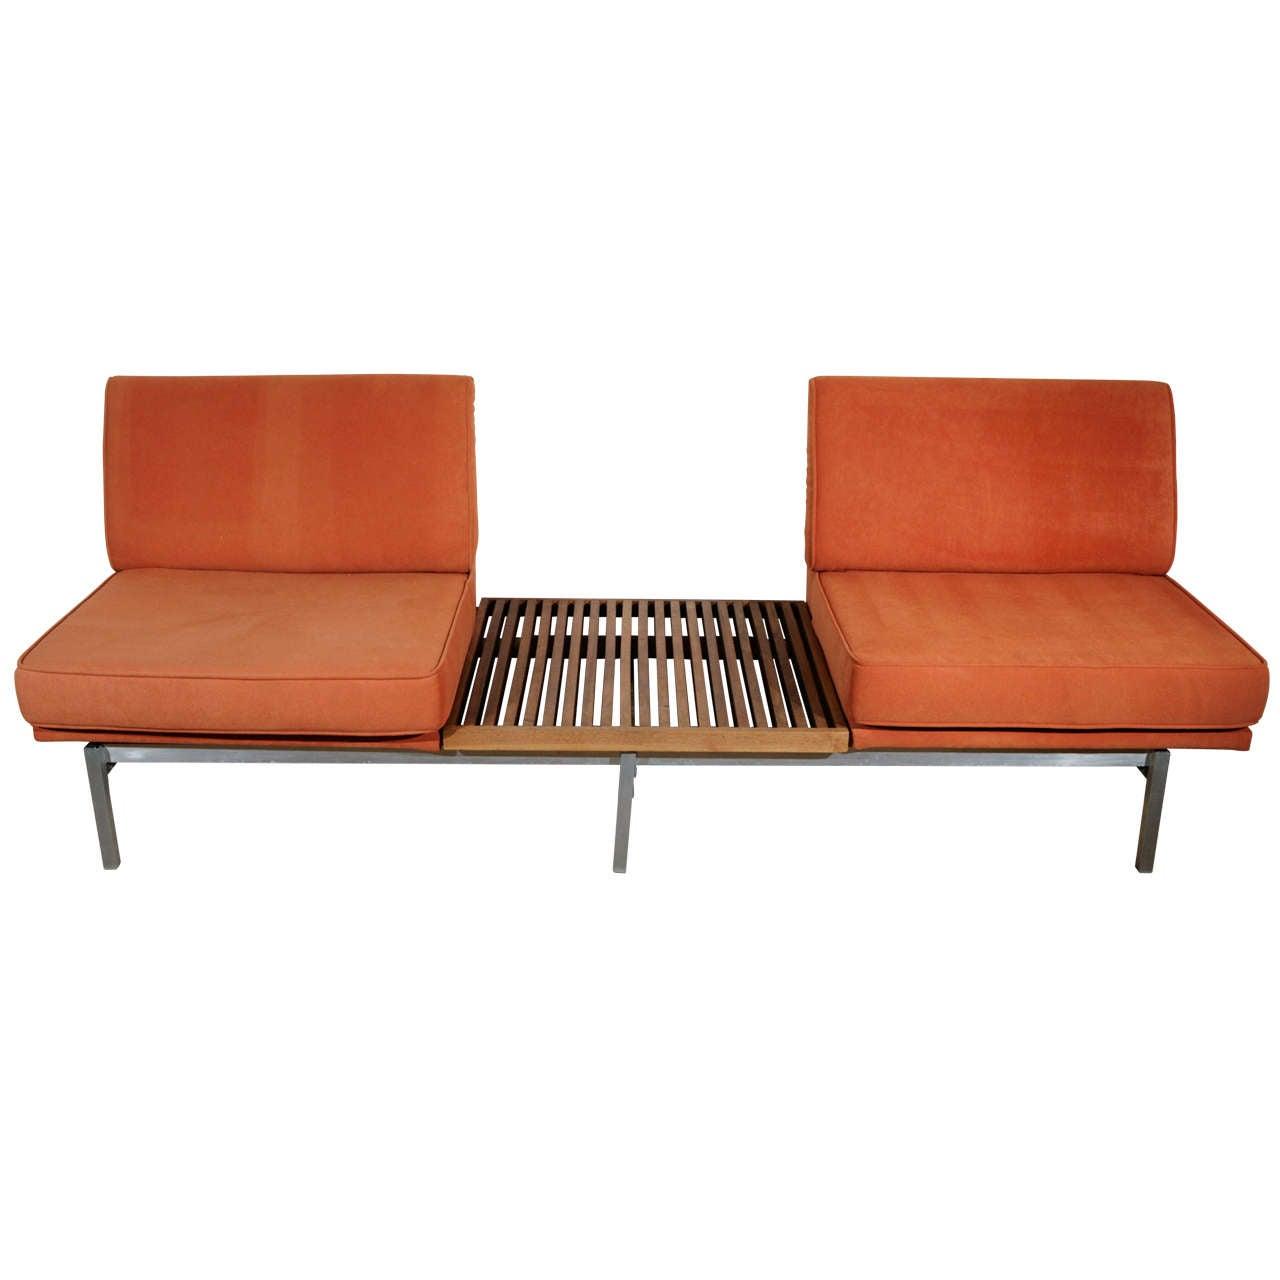 Modular Mid Century Sofa At 1stdibs